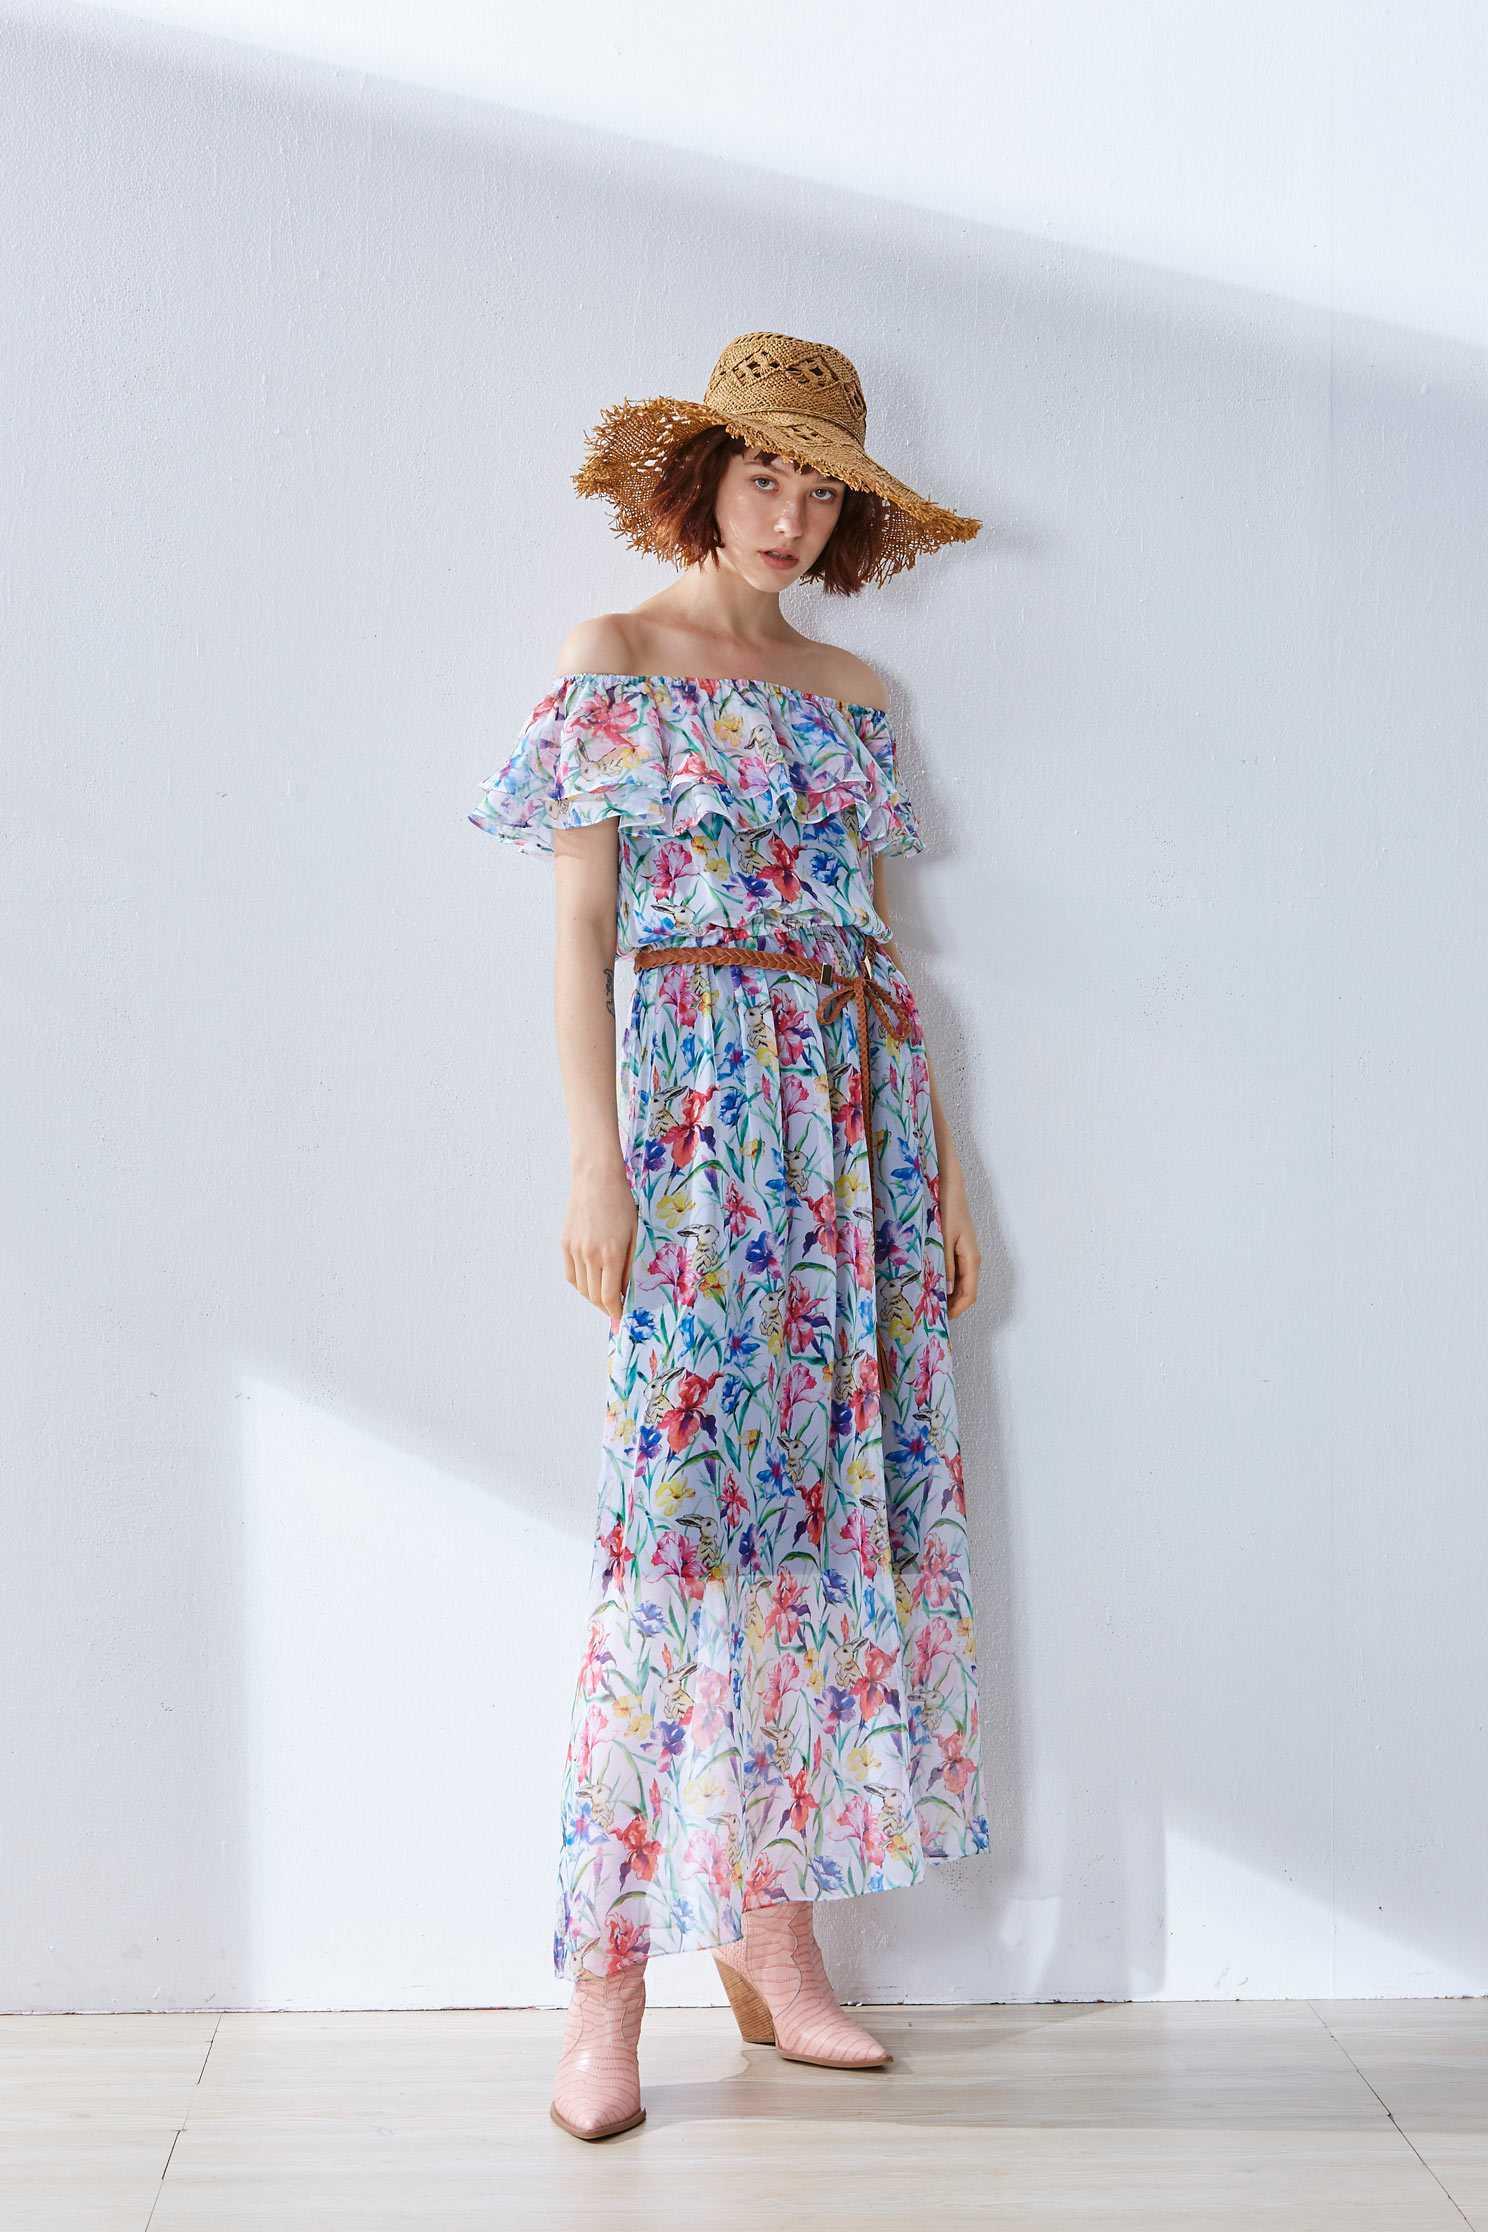 Translucent floral design dress,boatneckdress,printeddress,cocktaildress,shortsleevedress,chiffon,chiffondress